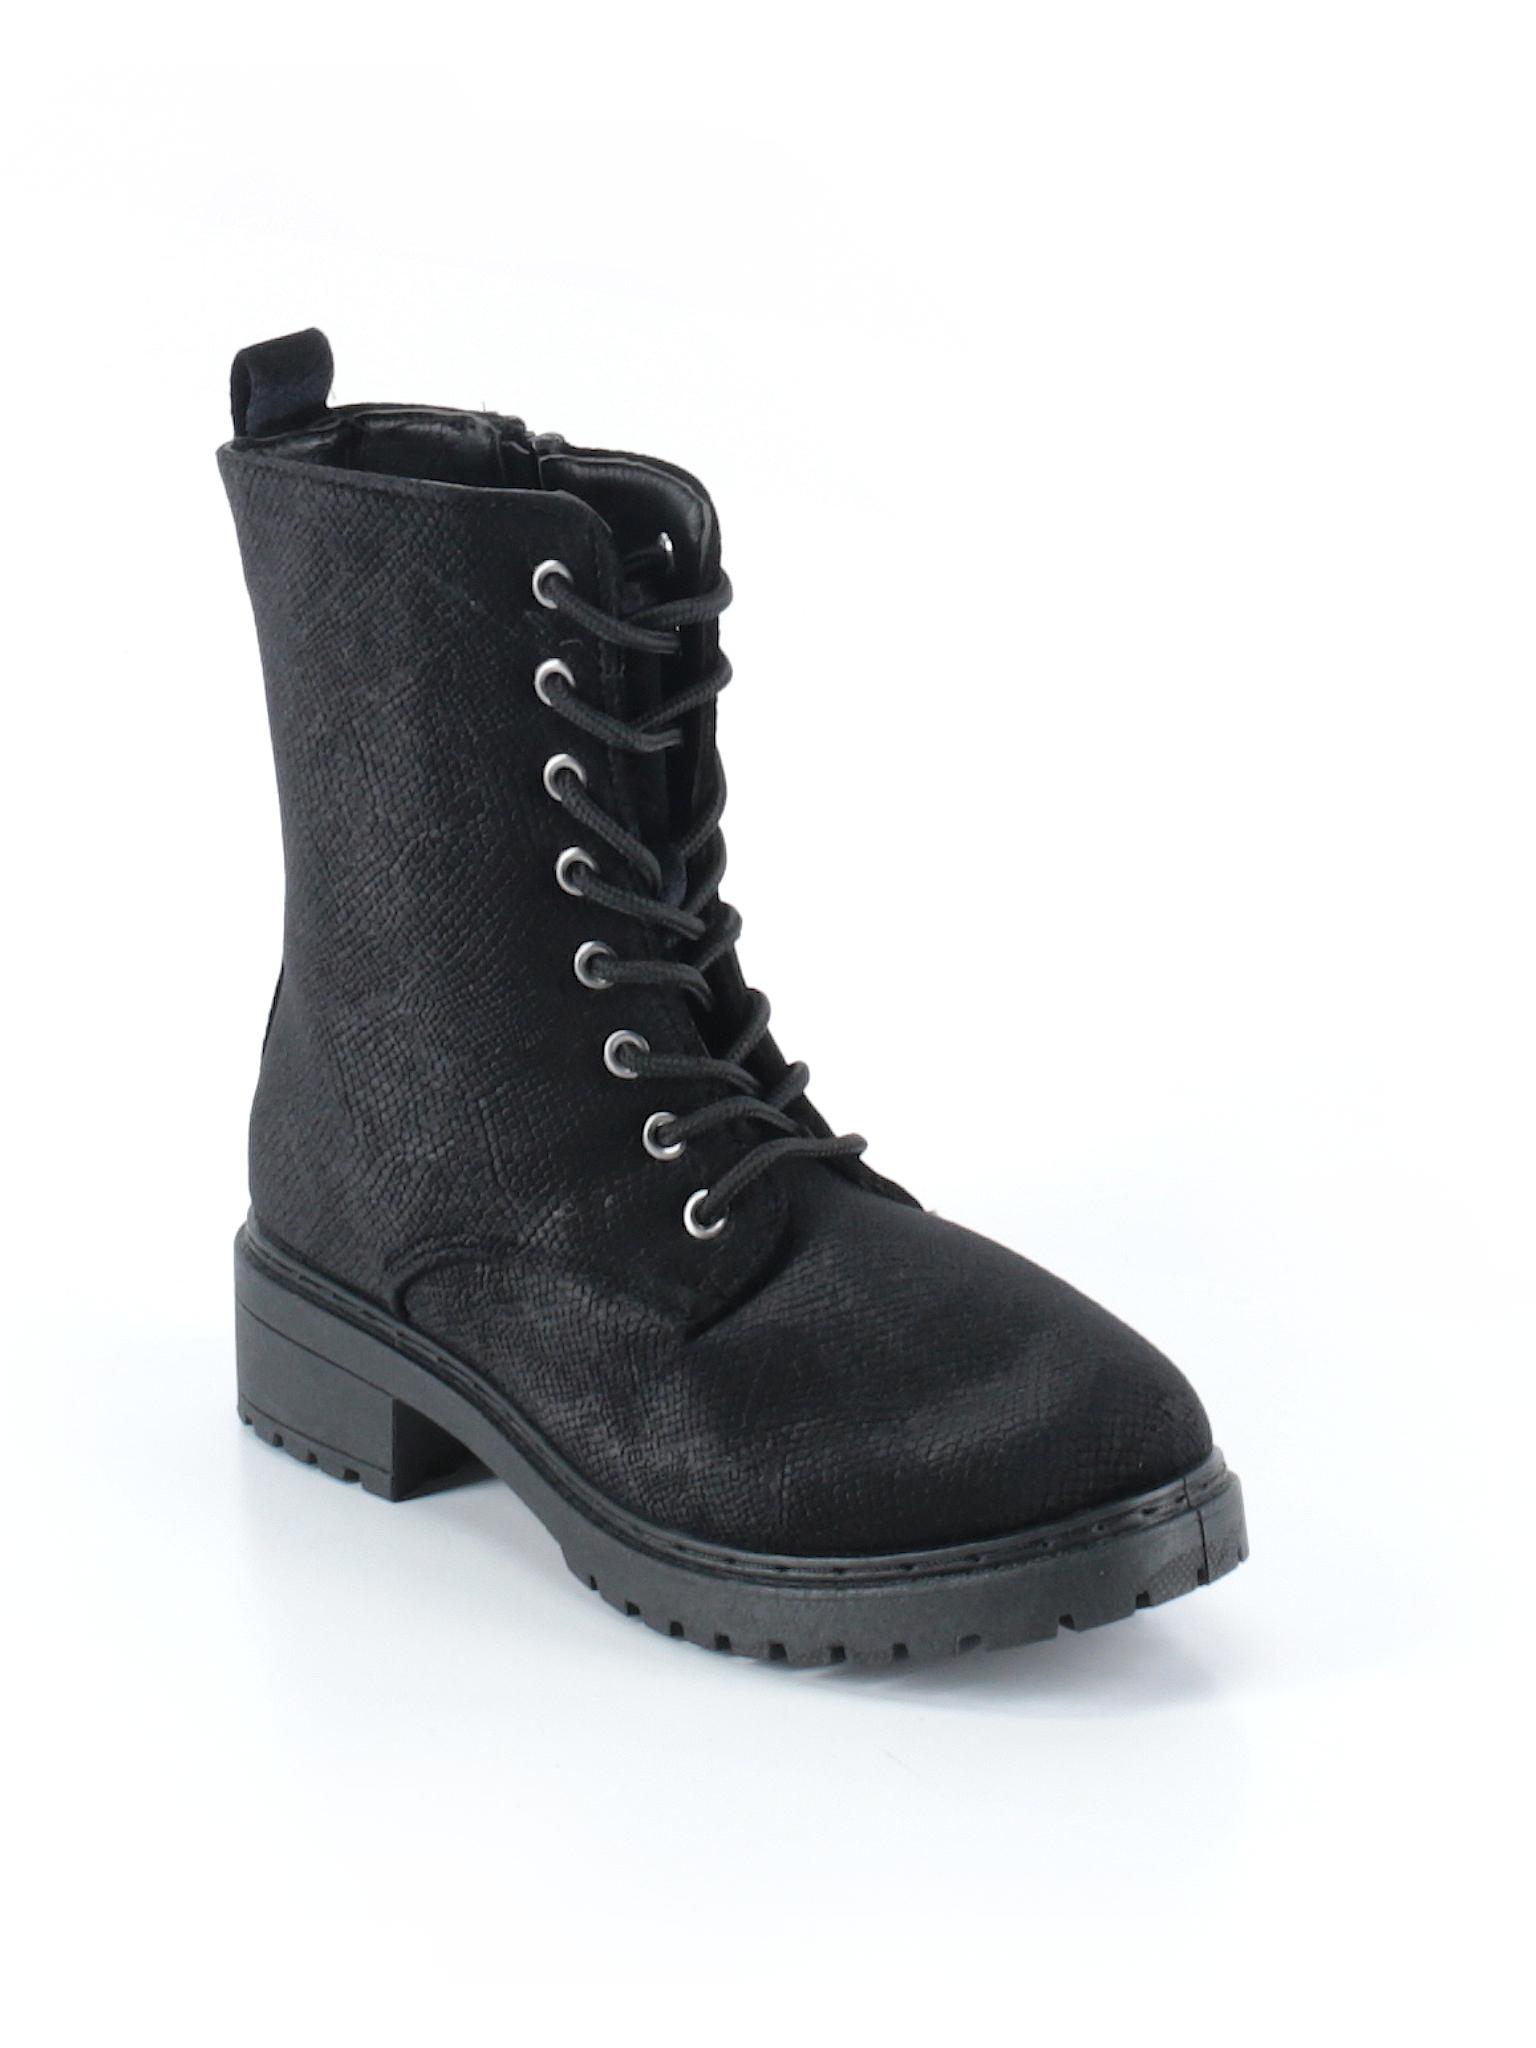 Boutique Boutique Wanted promotion promotion Boots Wanted CSvqvwU